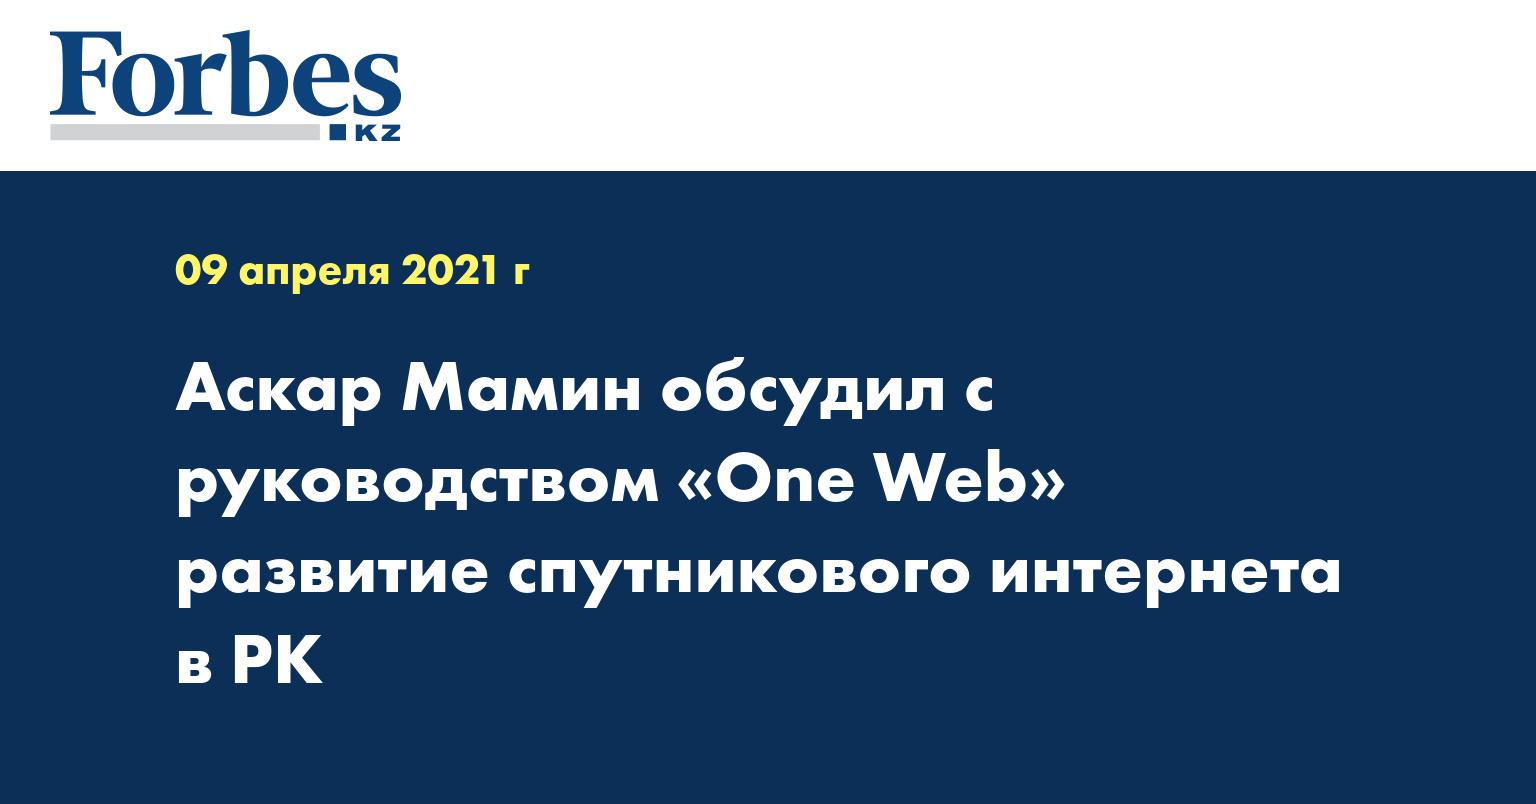 Аскар Мамин обсудил с руководством «One Web» развитие спутникового интернета в РК